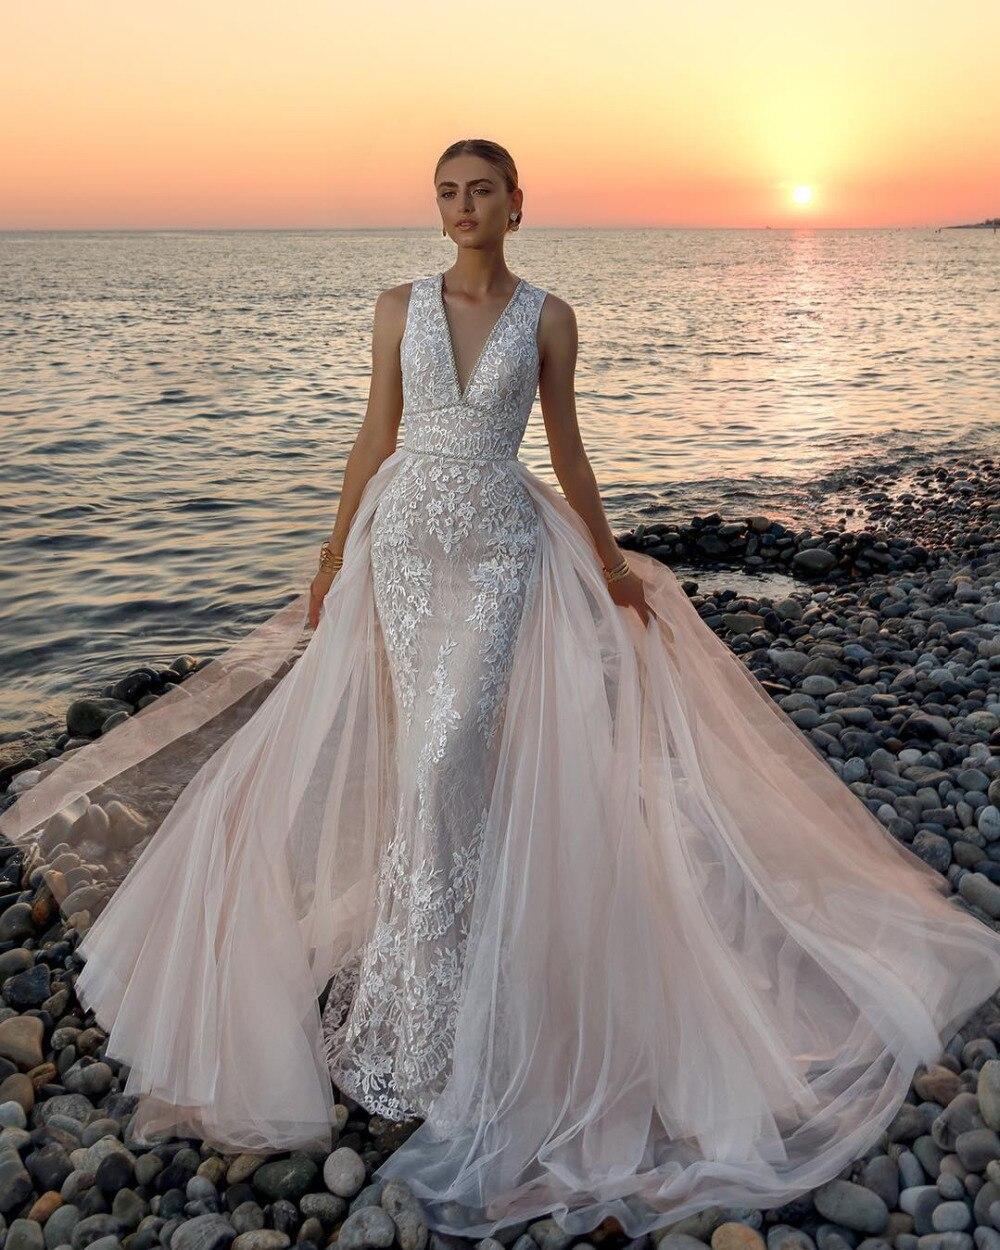 Eslieb High-end Custom made Lace Wedding dress 2019 Deep V-neck Wedding dresses  Bridal Dresses China